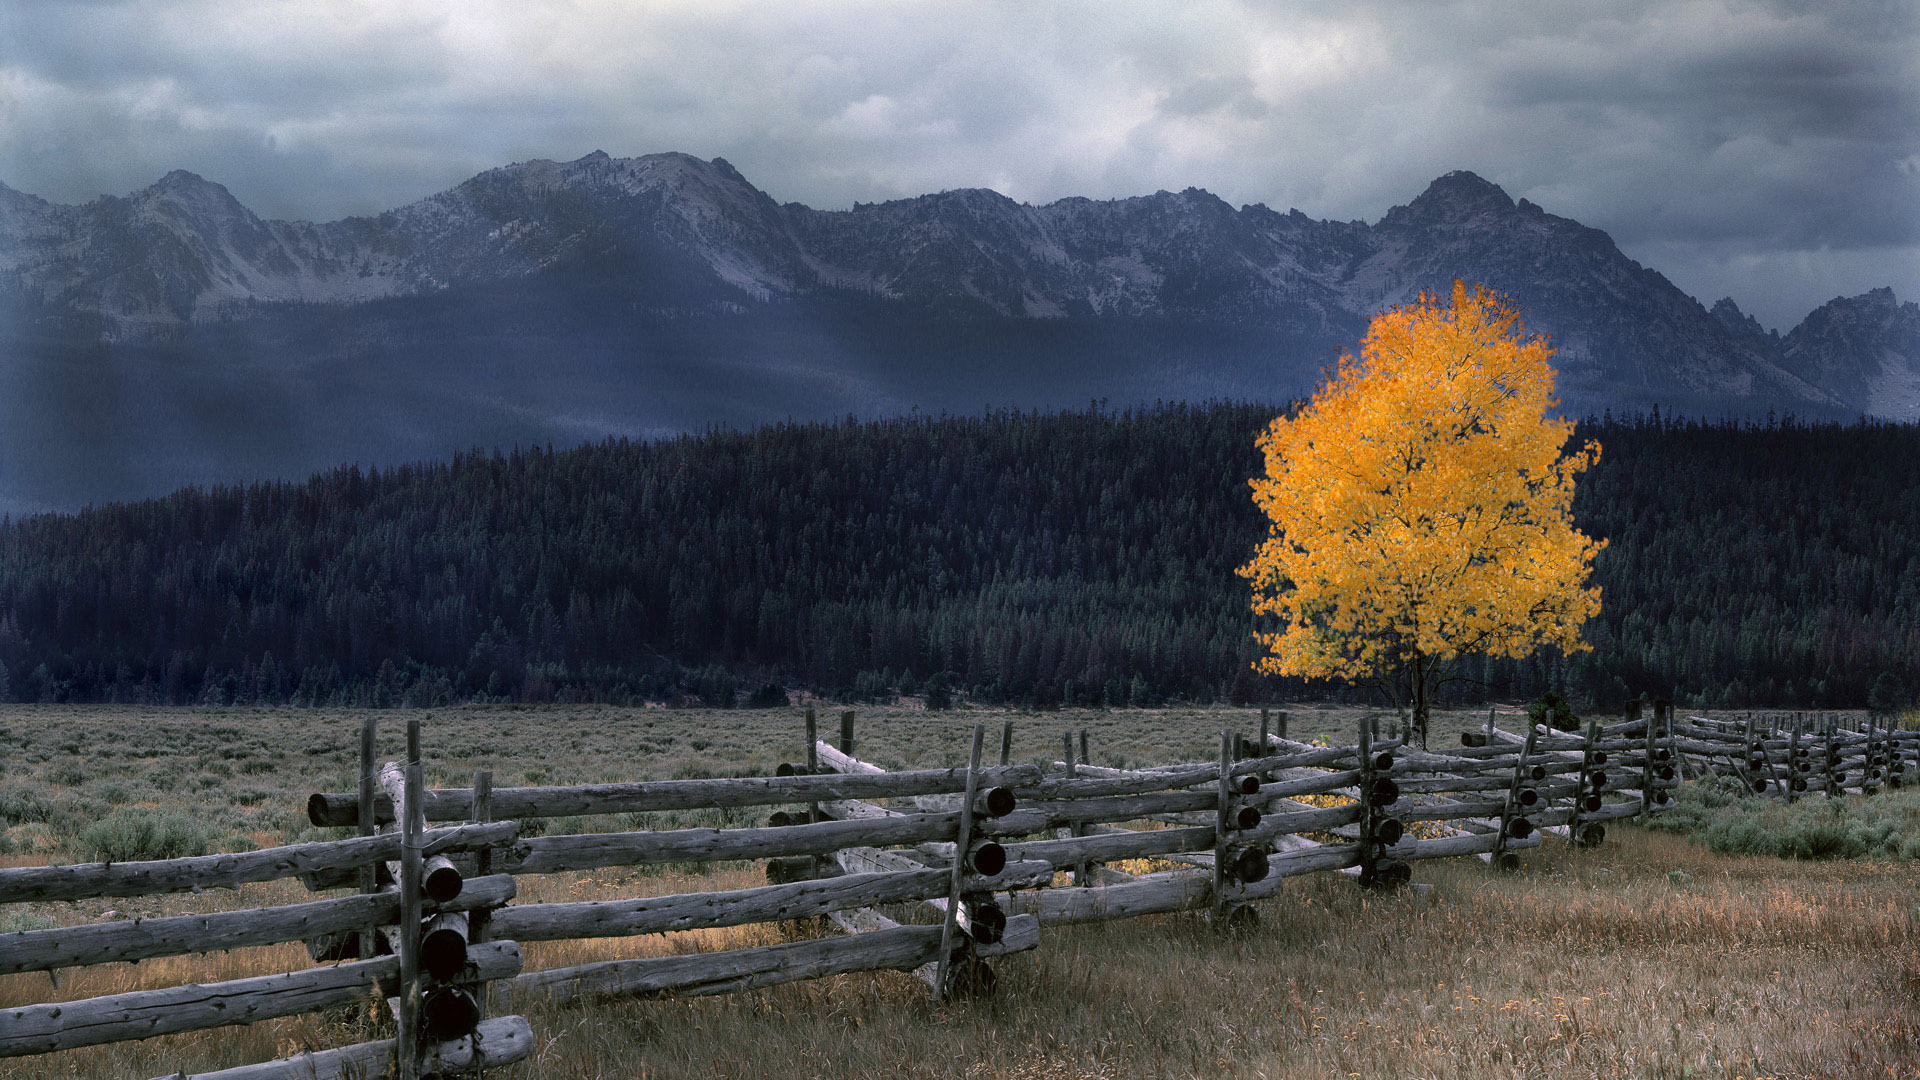 Free scenic wallpaper background